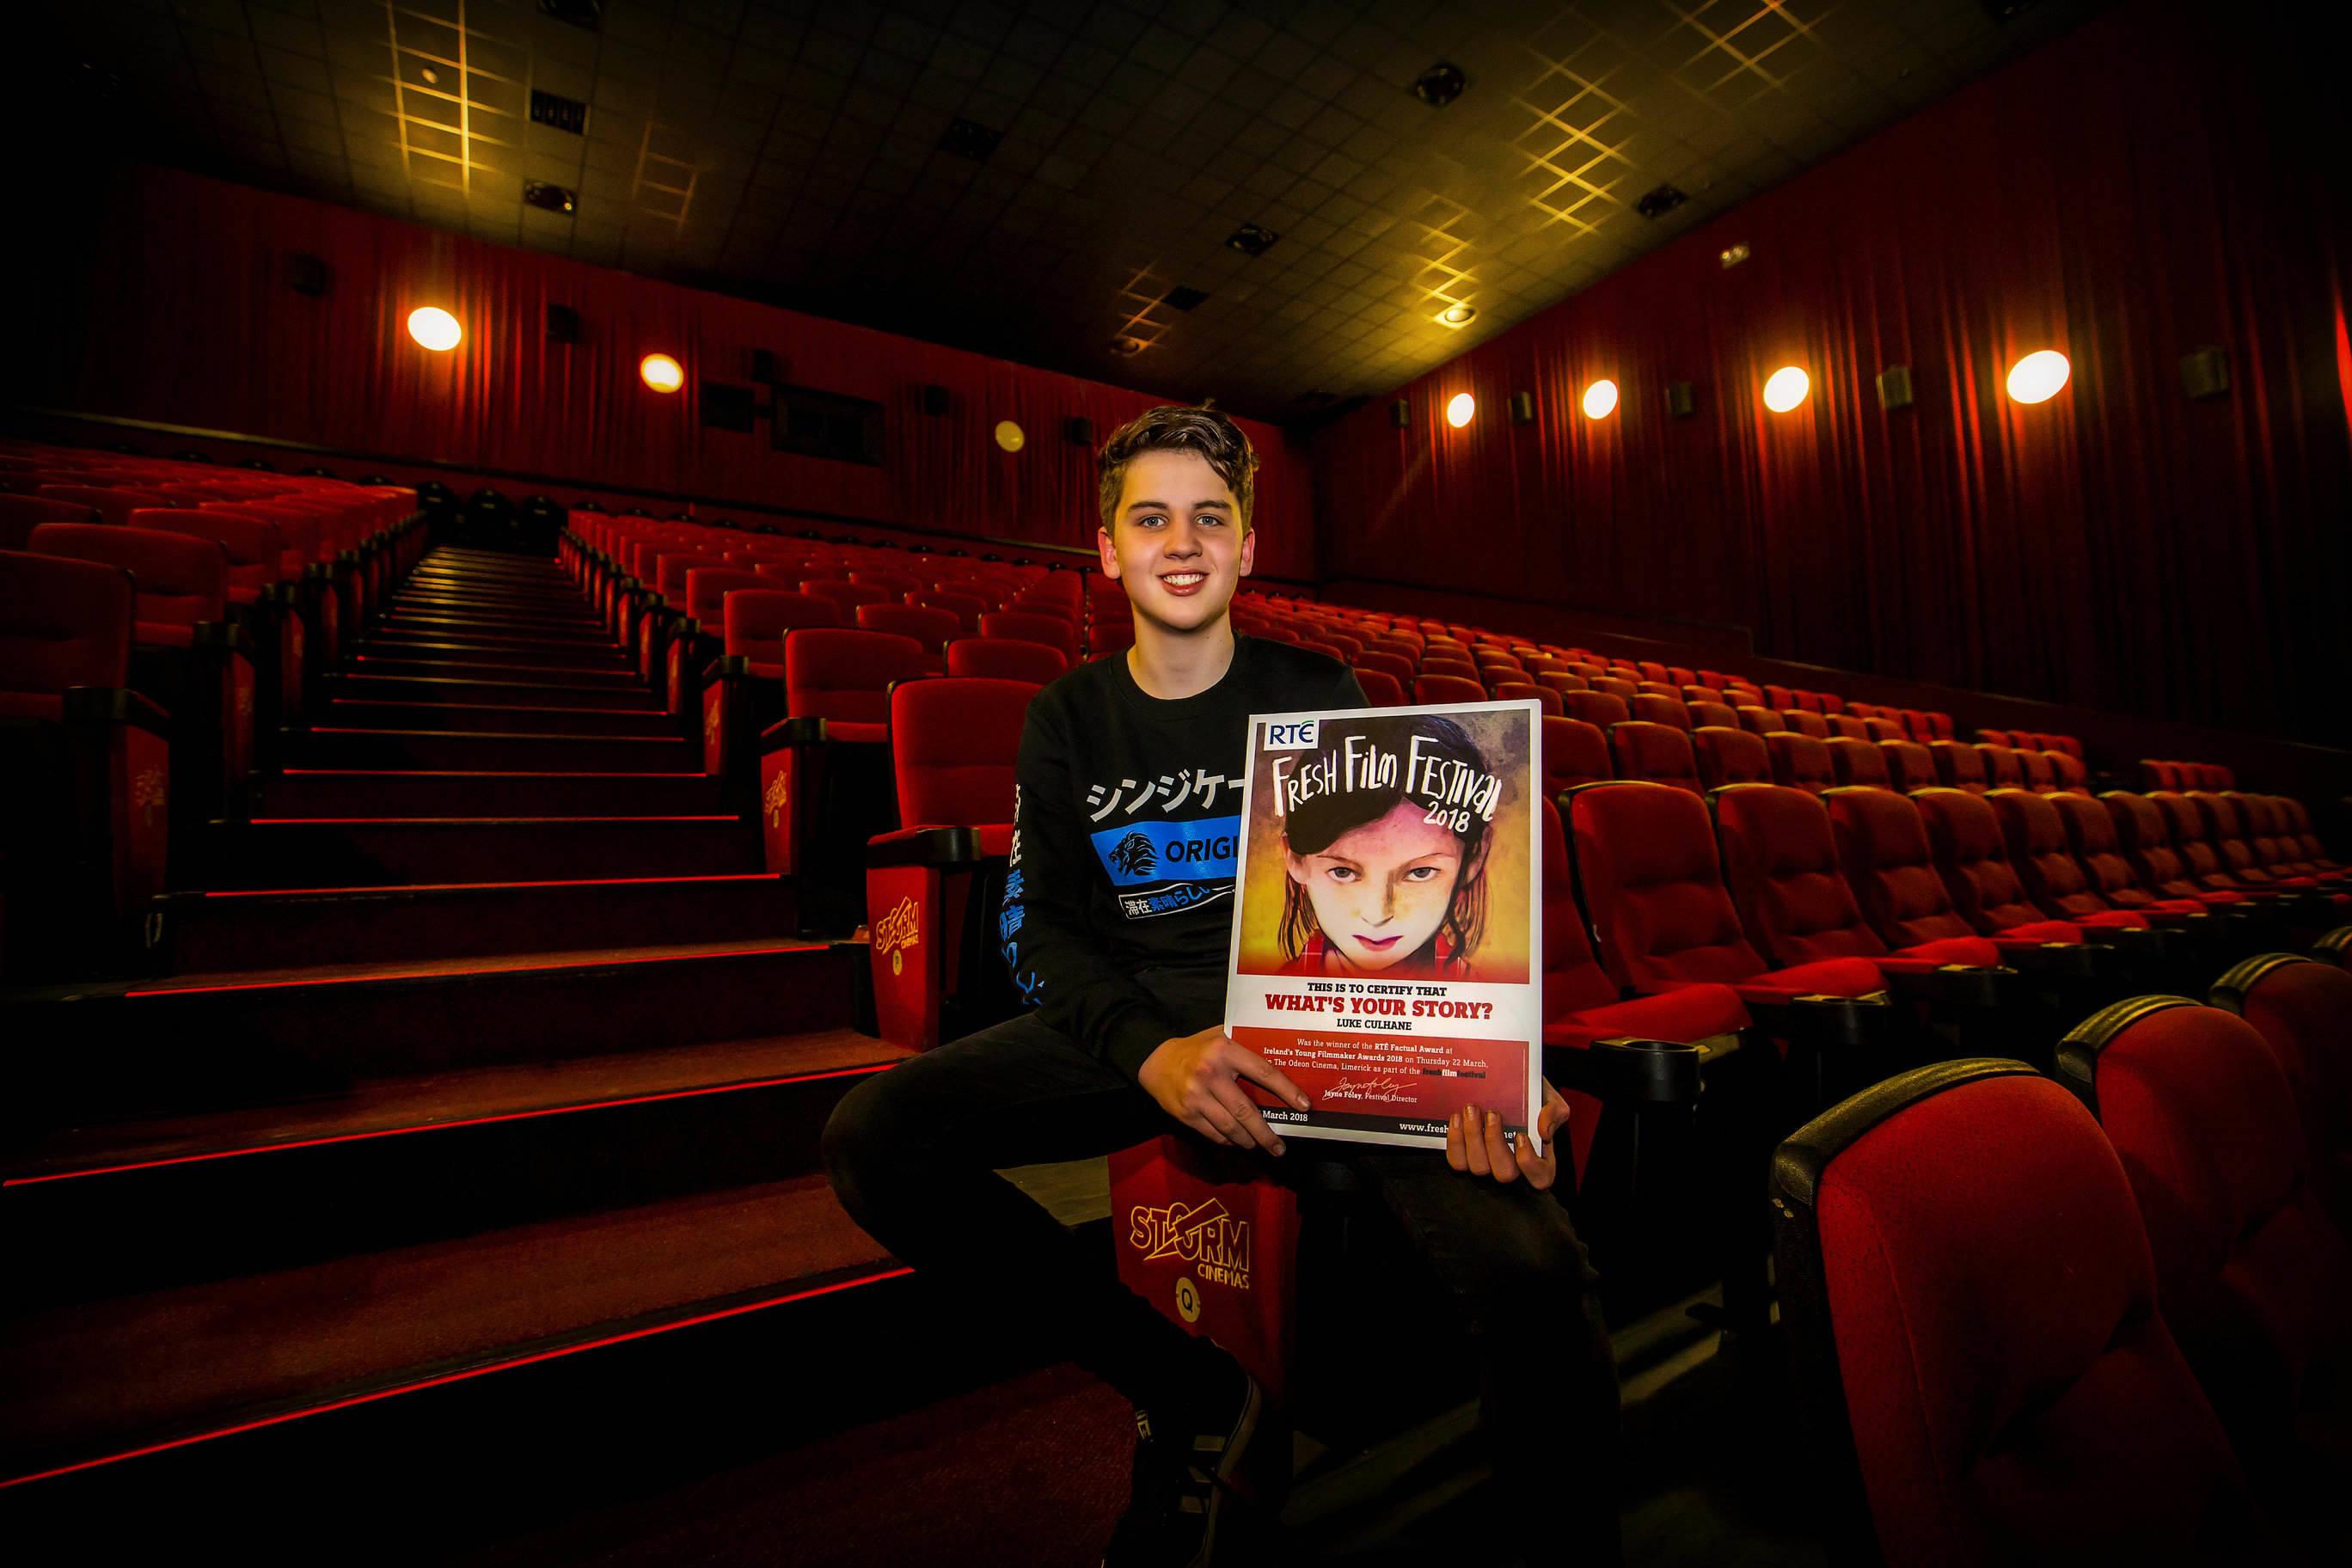 Irelands Young Filmmaker of the Year 2018 Senior finals